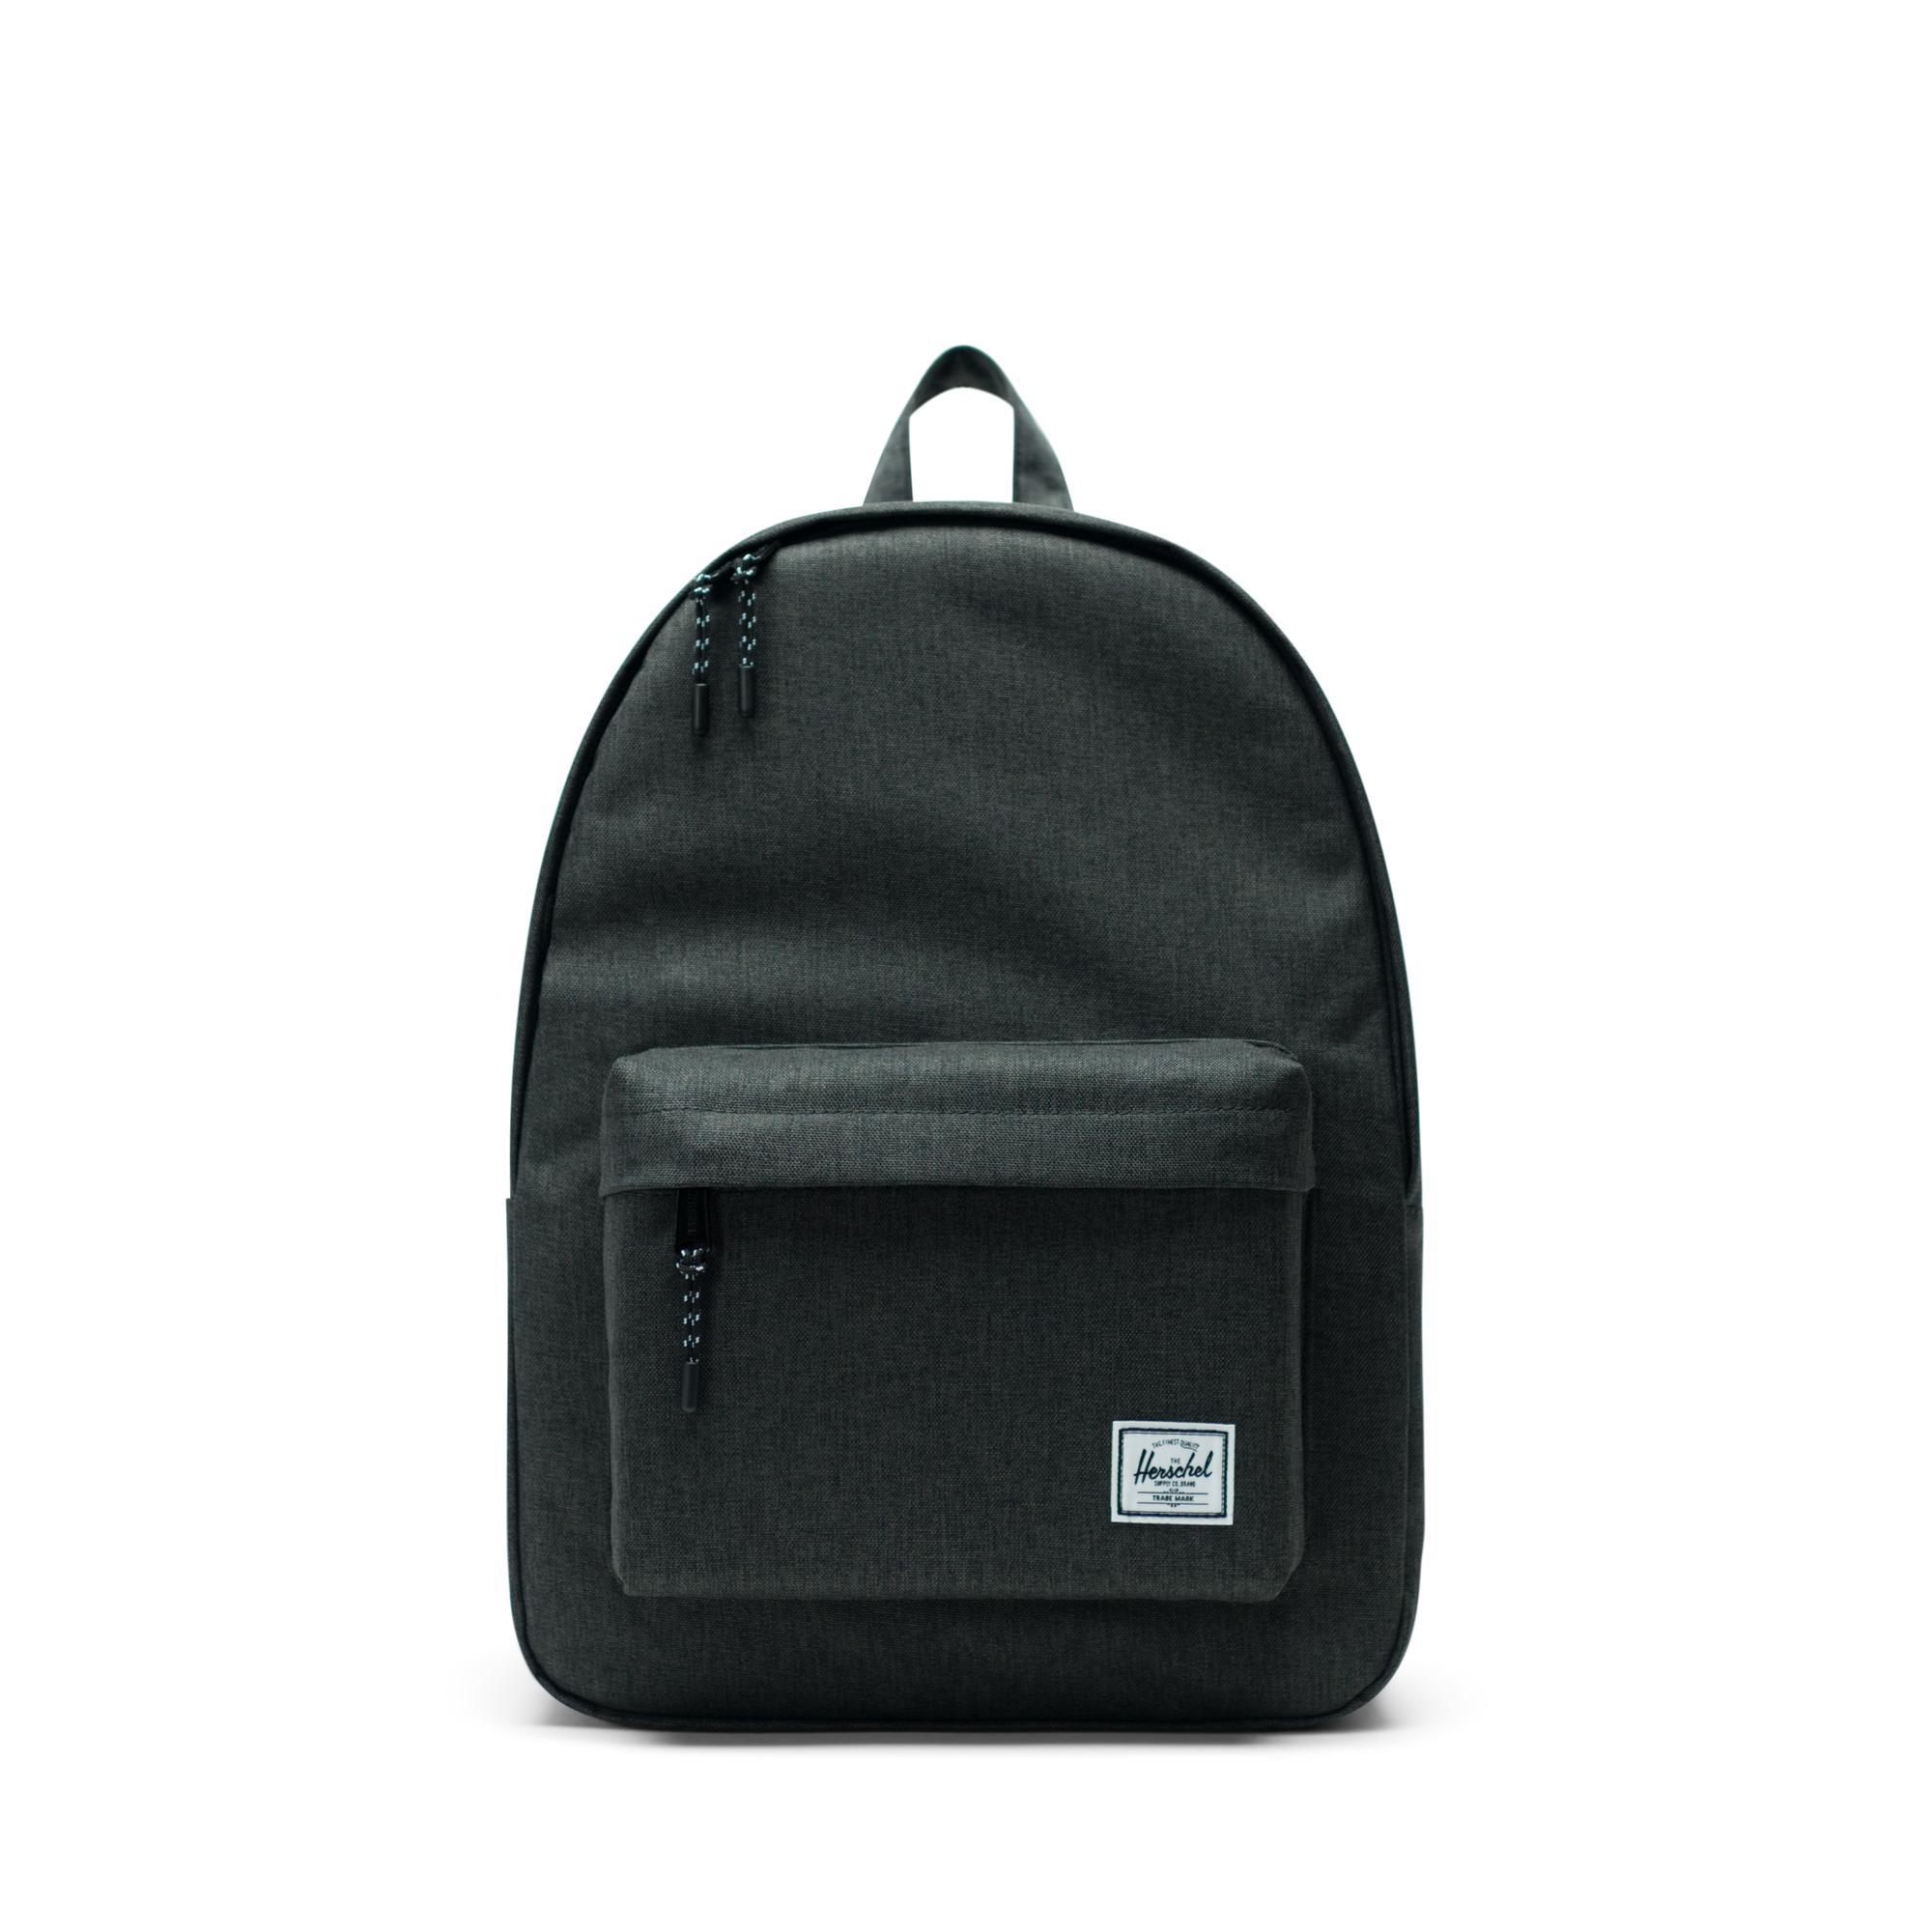 43a8aea5038 Classic Backpack   Herschel Supply Company